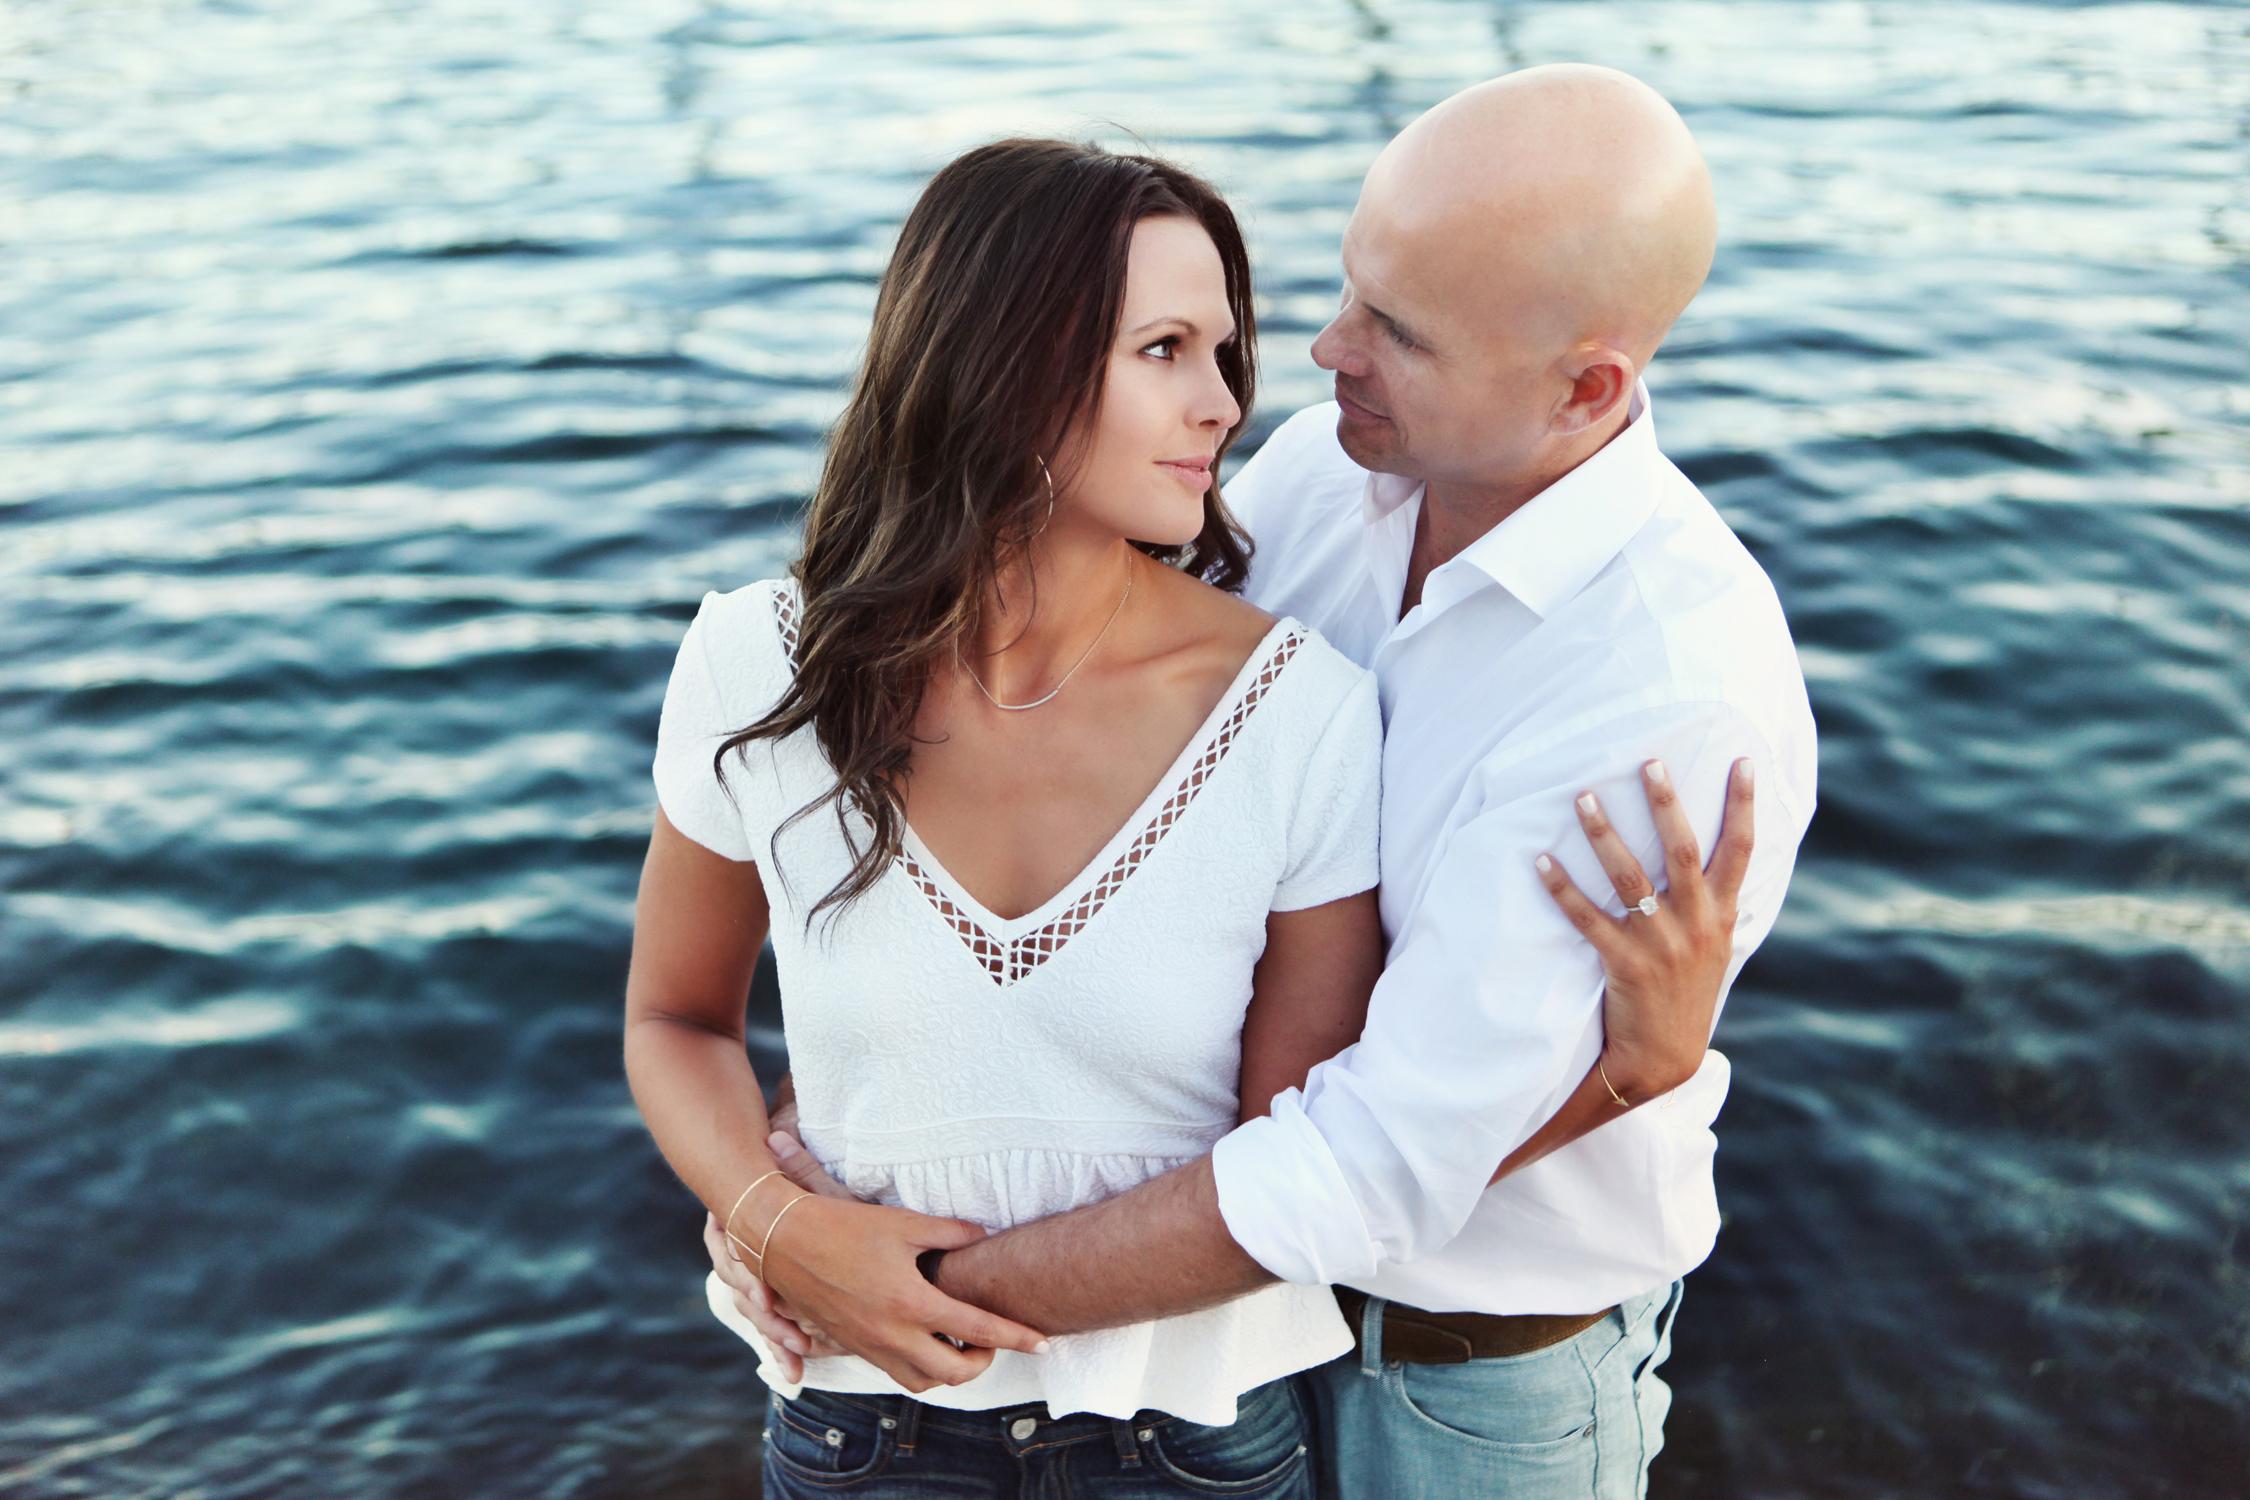 VIZCAYA-MIAMI-ENGAGEMENT-LIFESTYLE-WEDDING-SOUTHFLORIDAPHOTOGRAPHER-AMANDAJULCA-08.JPG